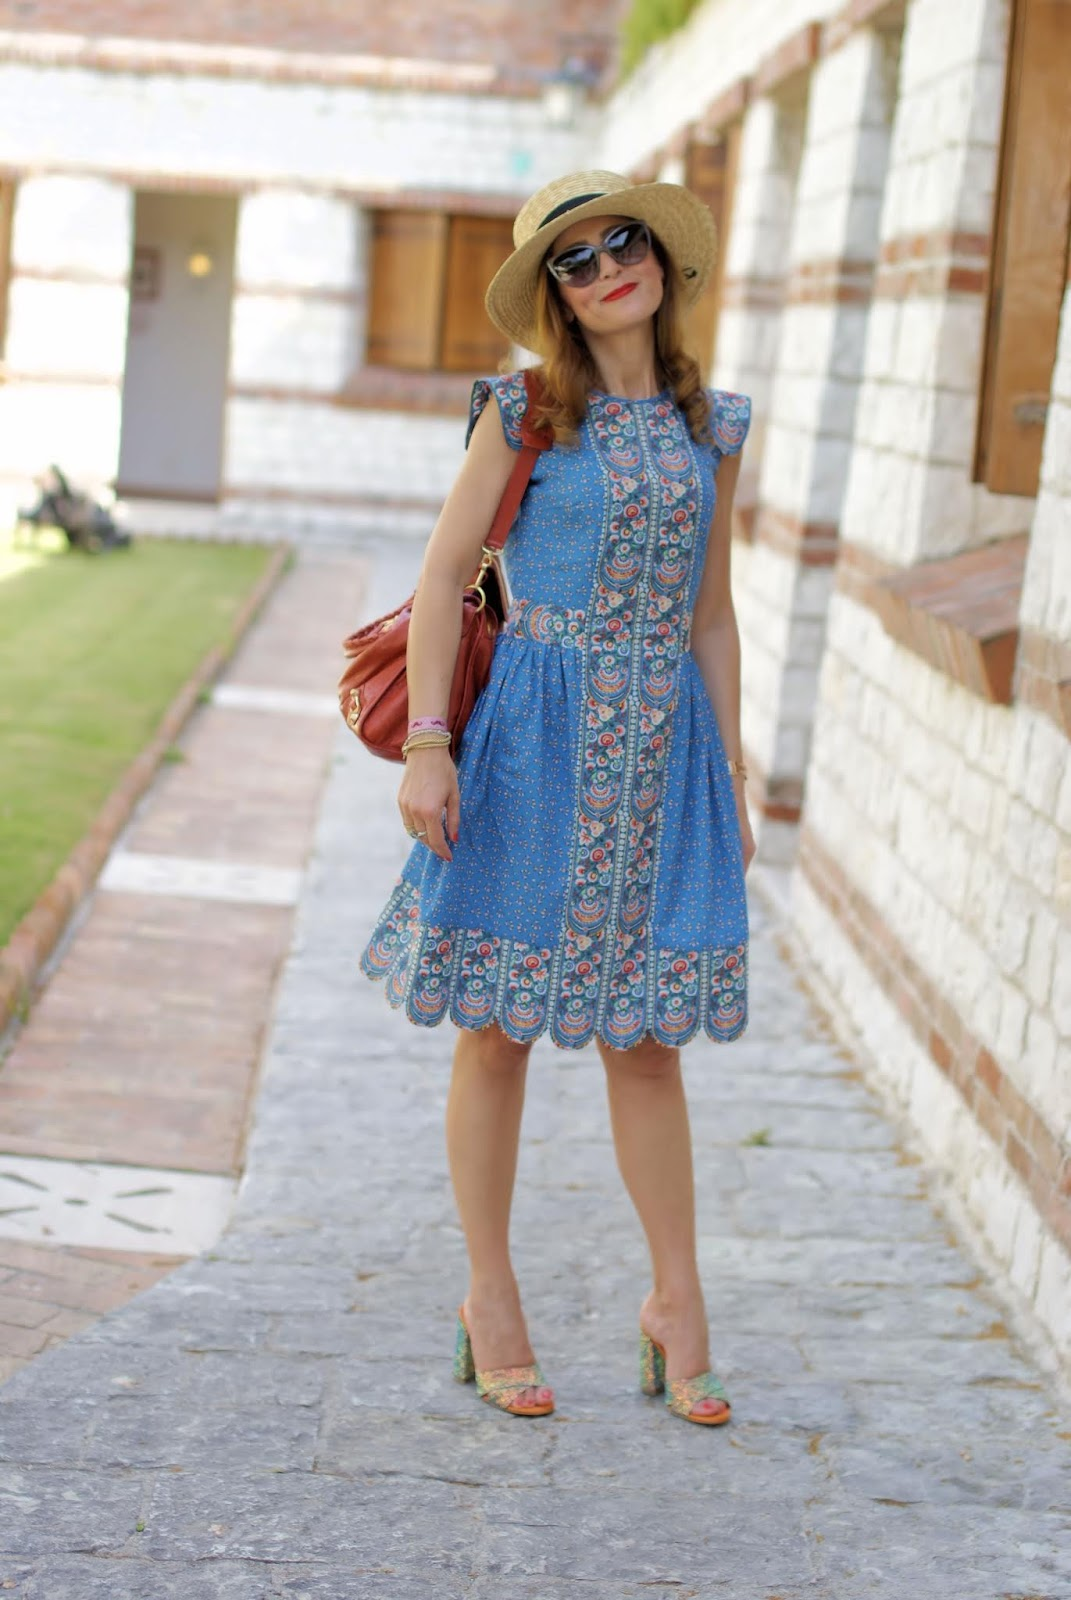 Vintage folk style summer dress on Fashion and Cookies fashion blog, fashion blogger style